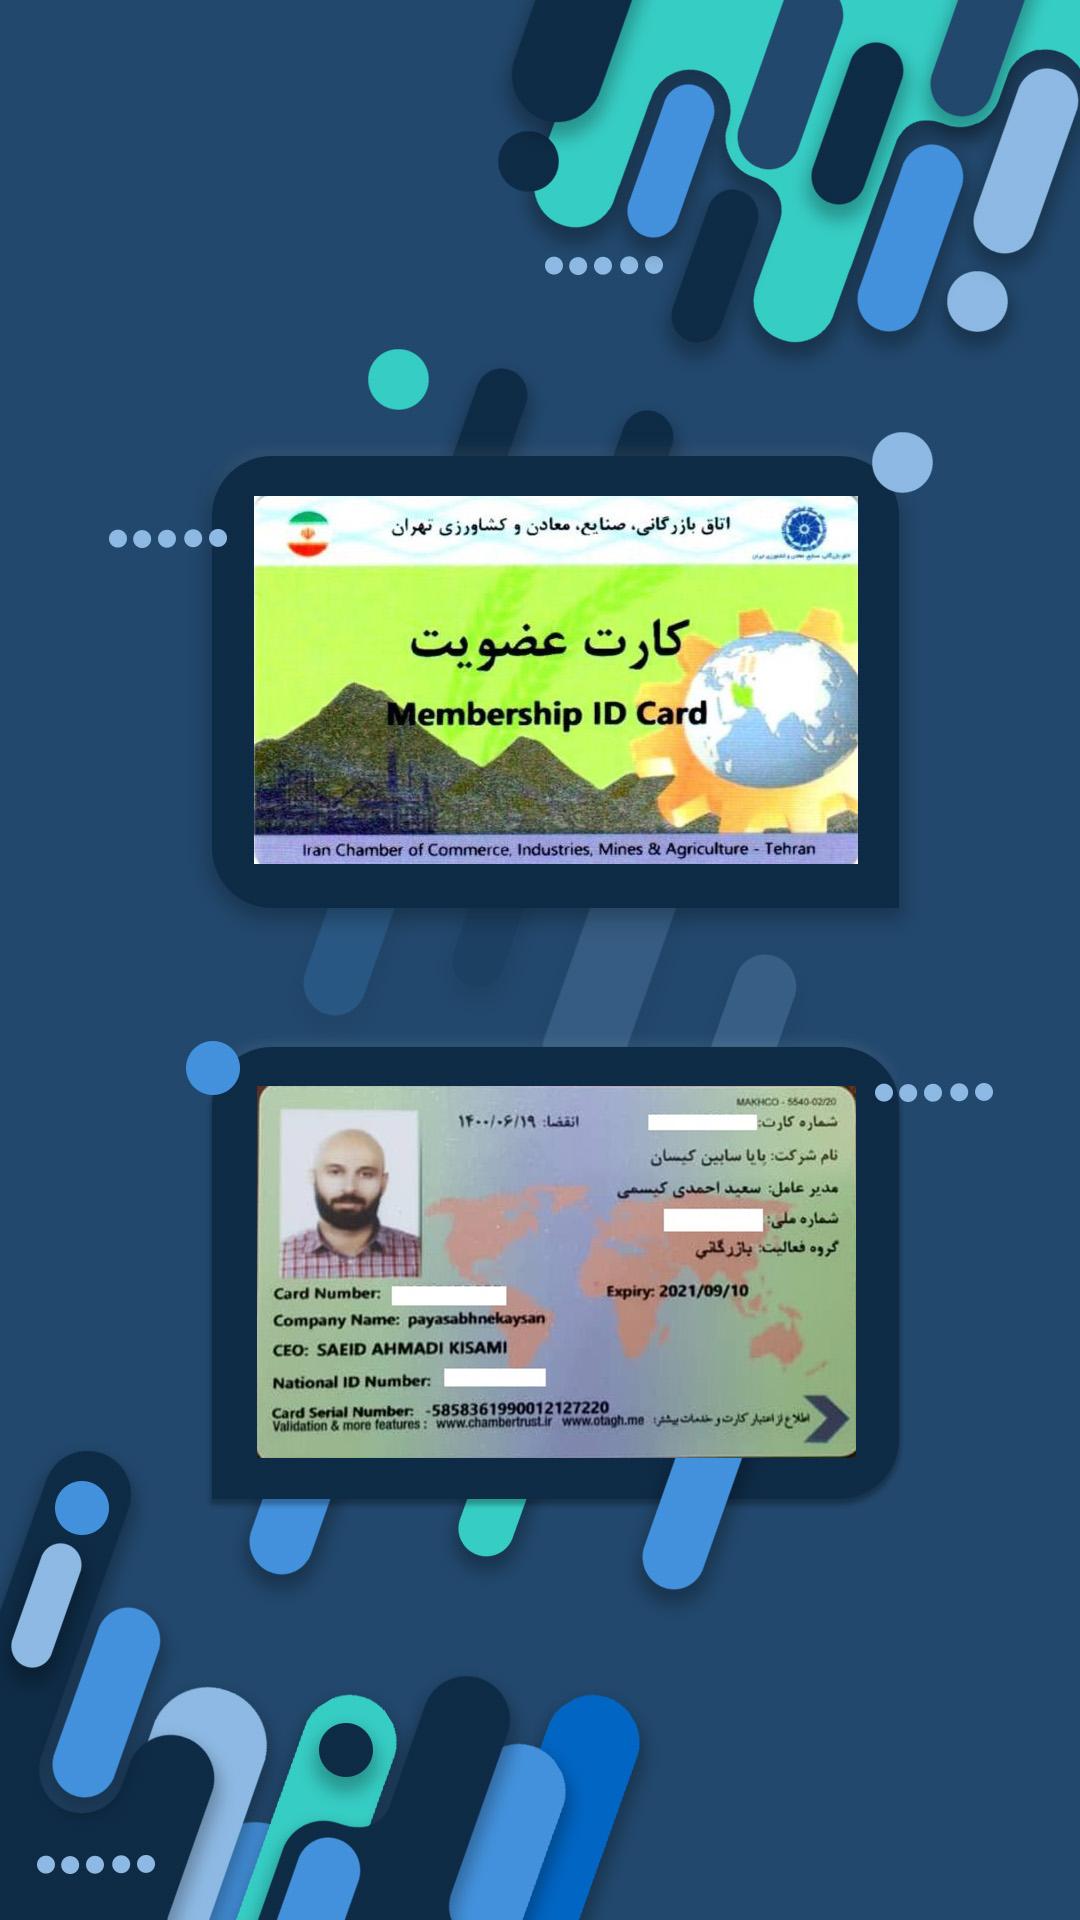 mahan-card-joind-.11-3999